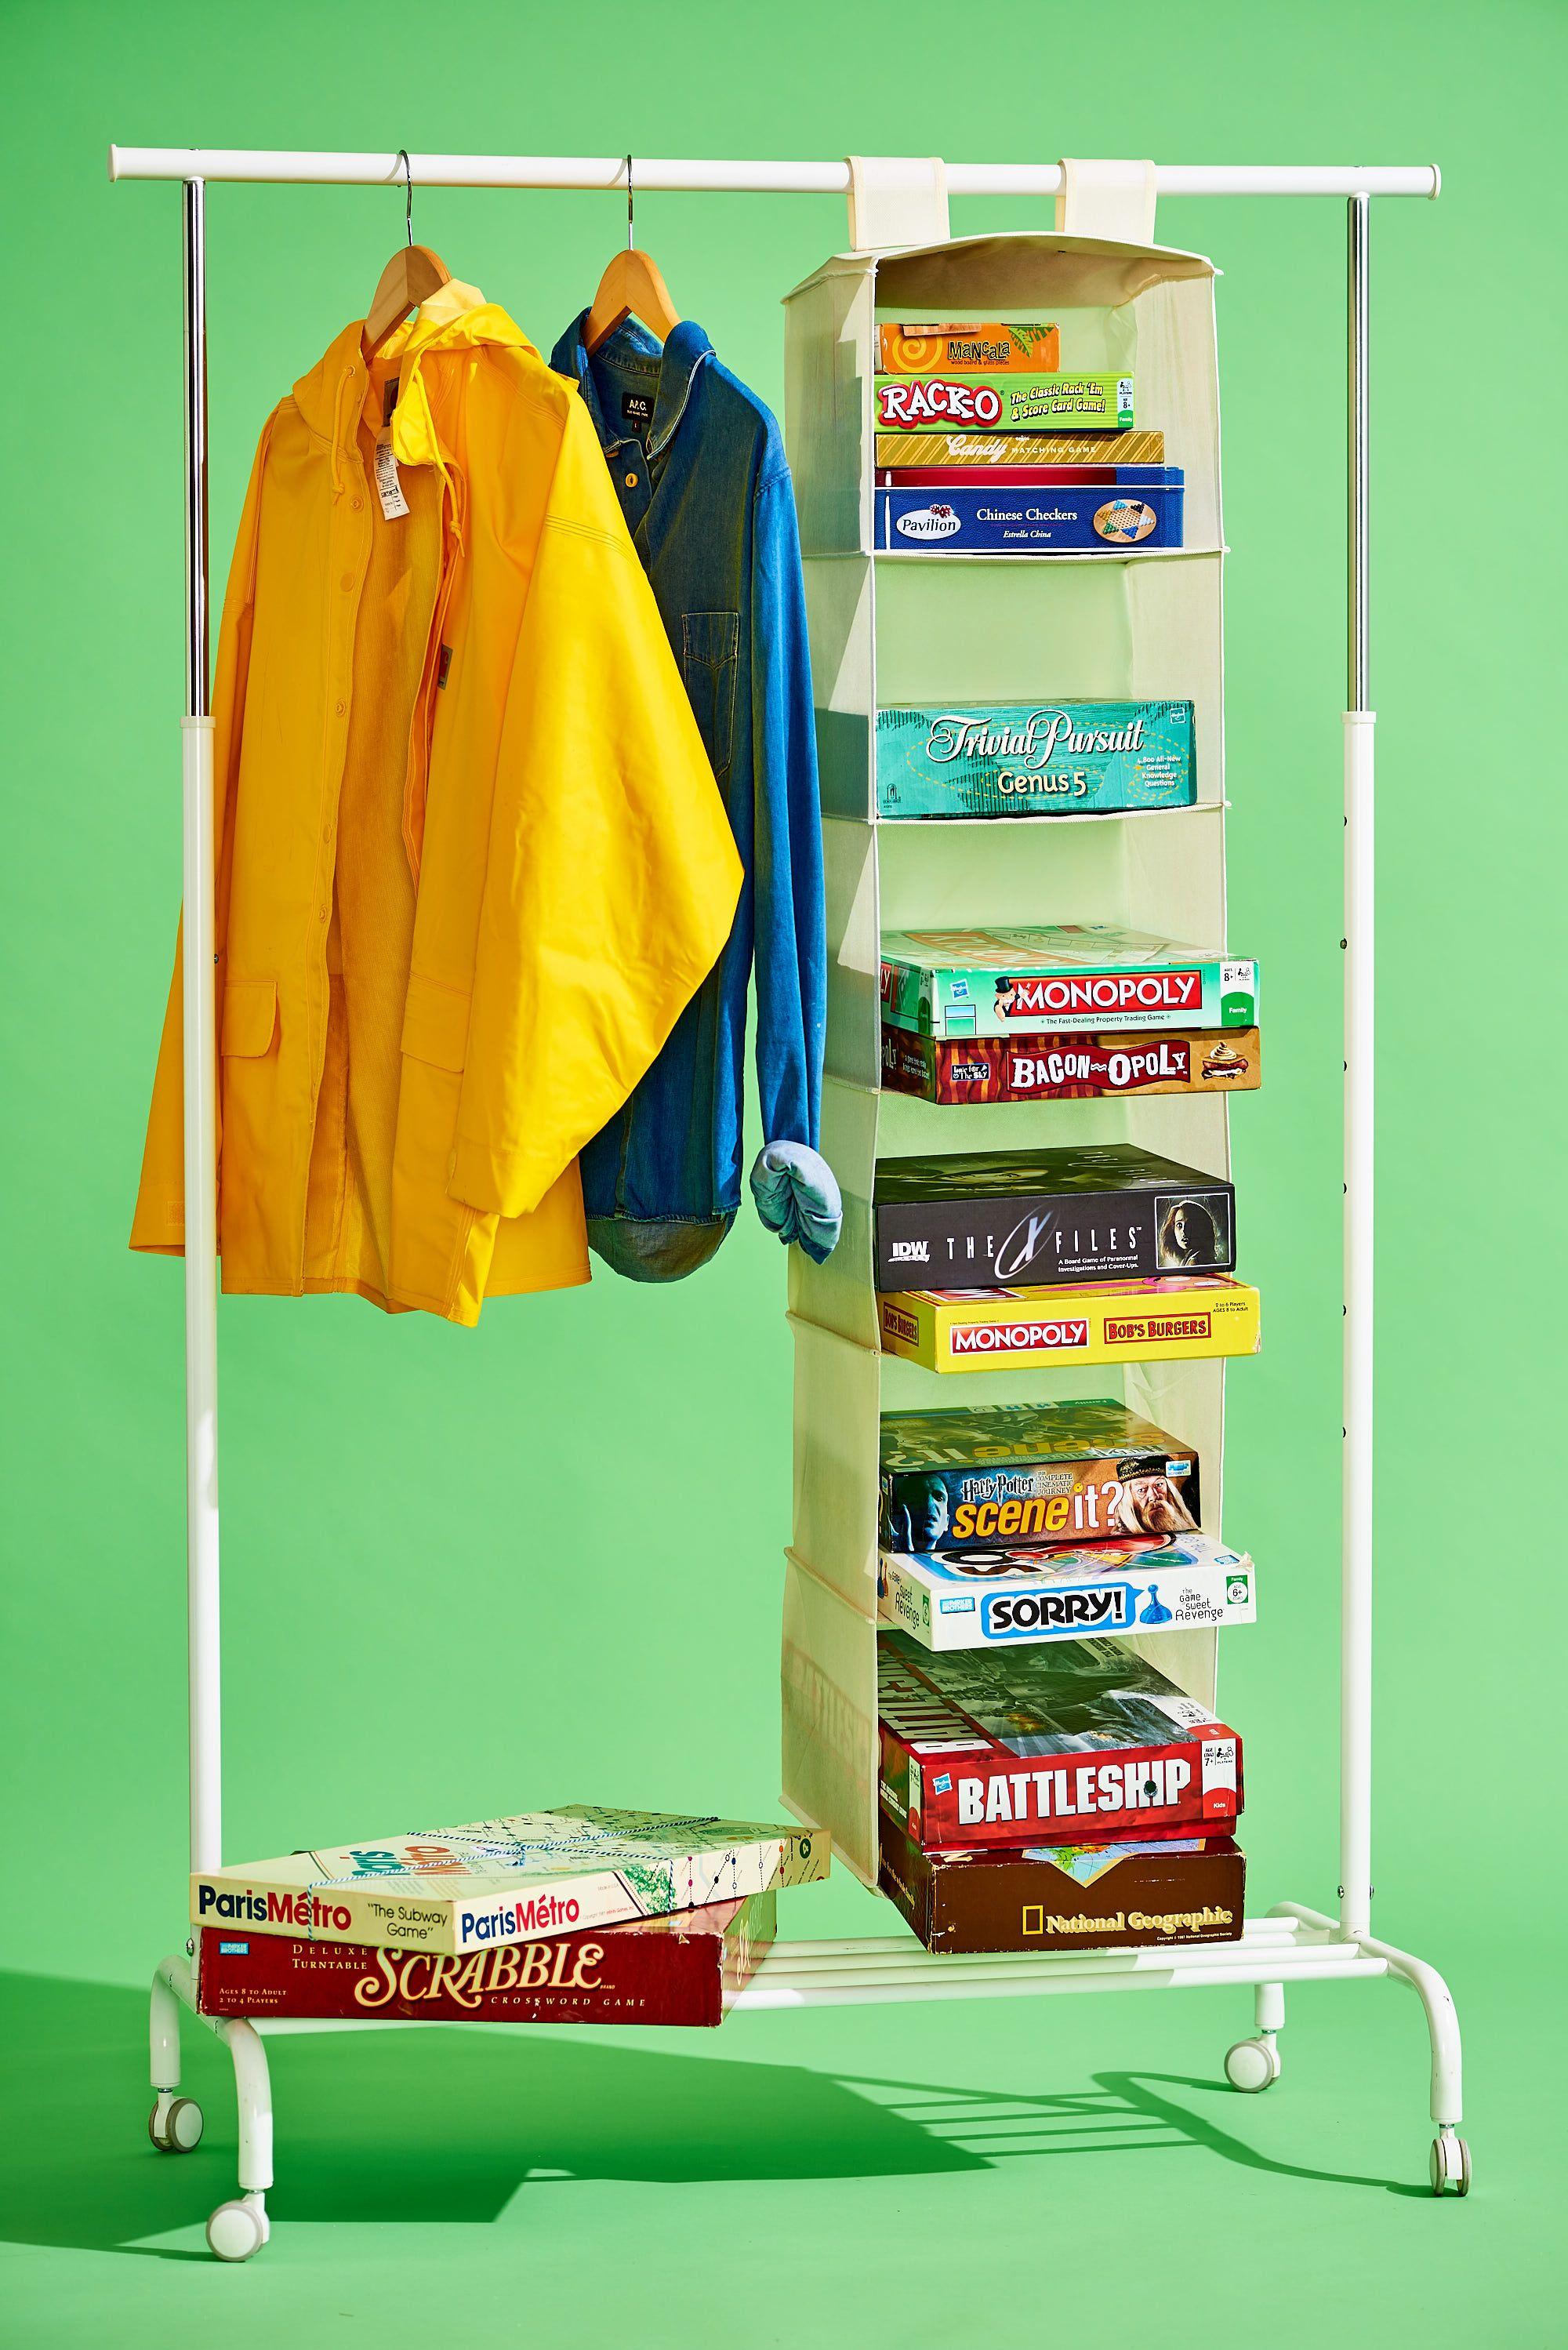 7 Smart Ways You Can Repurpose A Hanging Closet Organizer To Tidy Up Any Mess Hanging Closet Organizer Clever Storage Storage Hacks